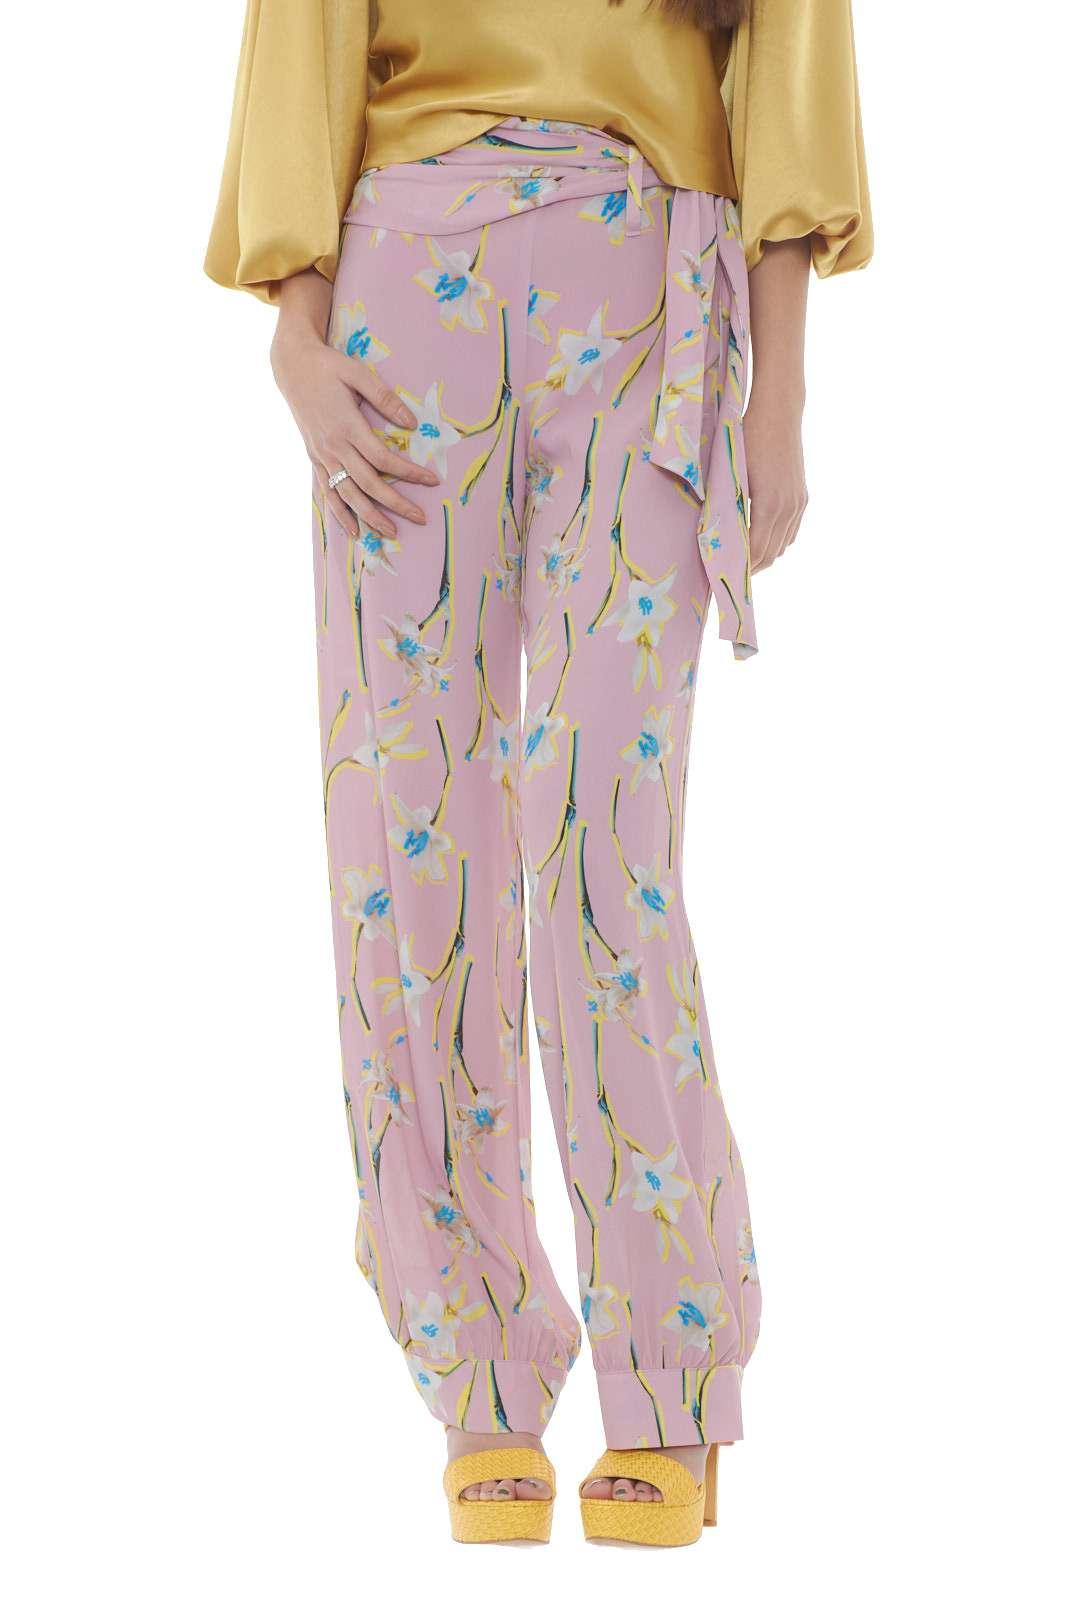 https://www.parmax.com/media/catalog/product/a/i/PE-outlet_parmax-pantaloni-donna-Pinko-1g14kc-A.jpg